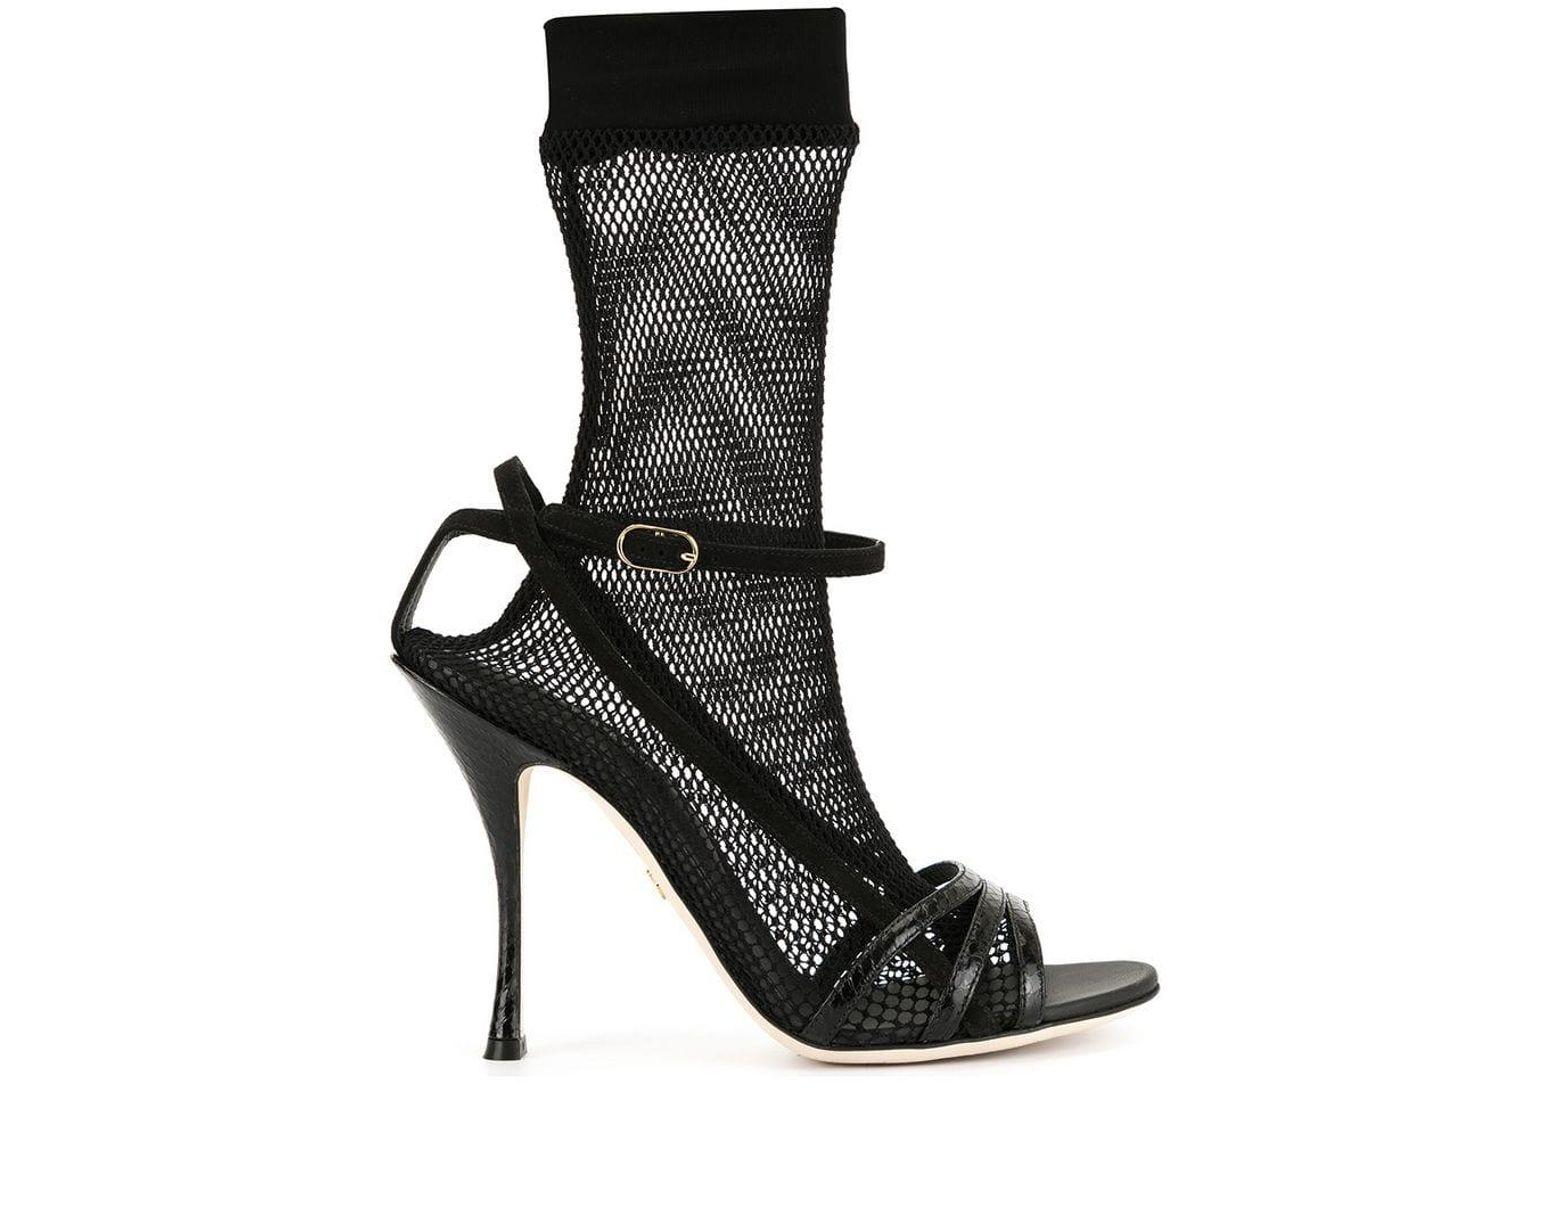 Dolceamp; Black Gabbana Sandals Lyst Sock Fishnet Heeled In nw08OkXNPZ